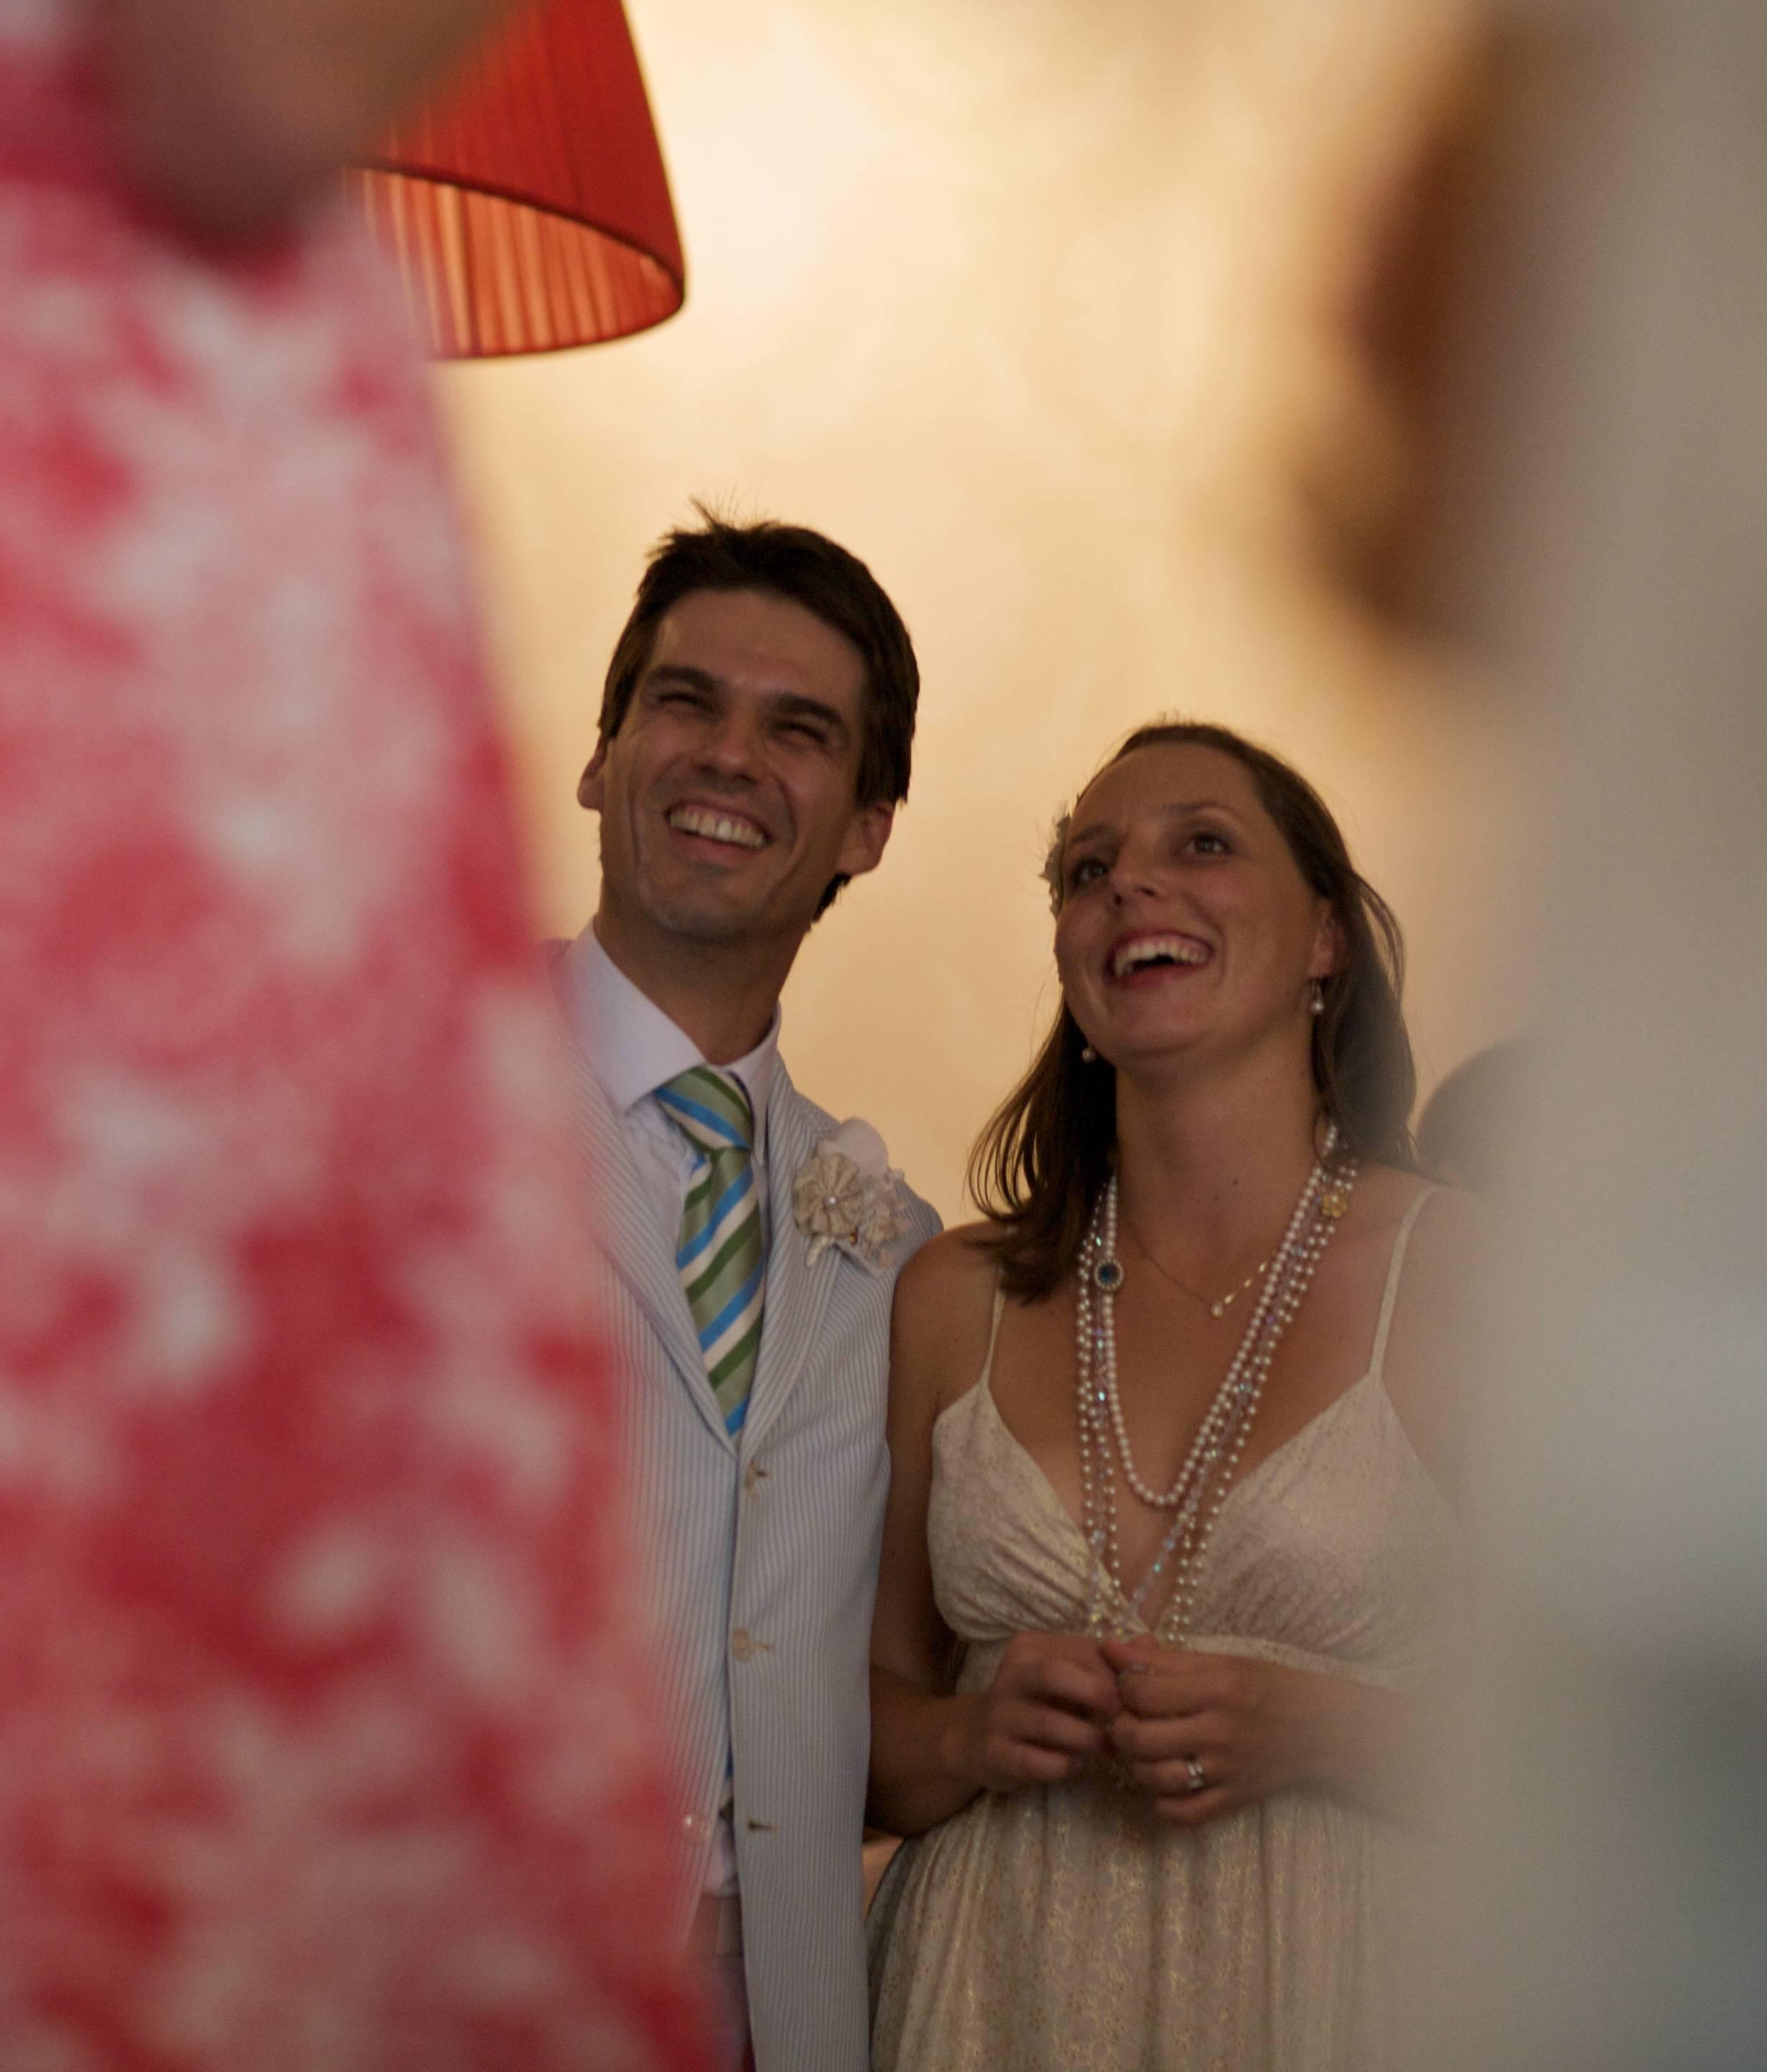 40th Wedding Anniversary Speech For Parents